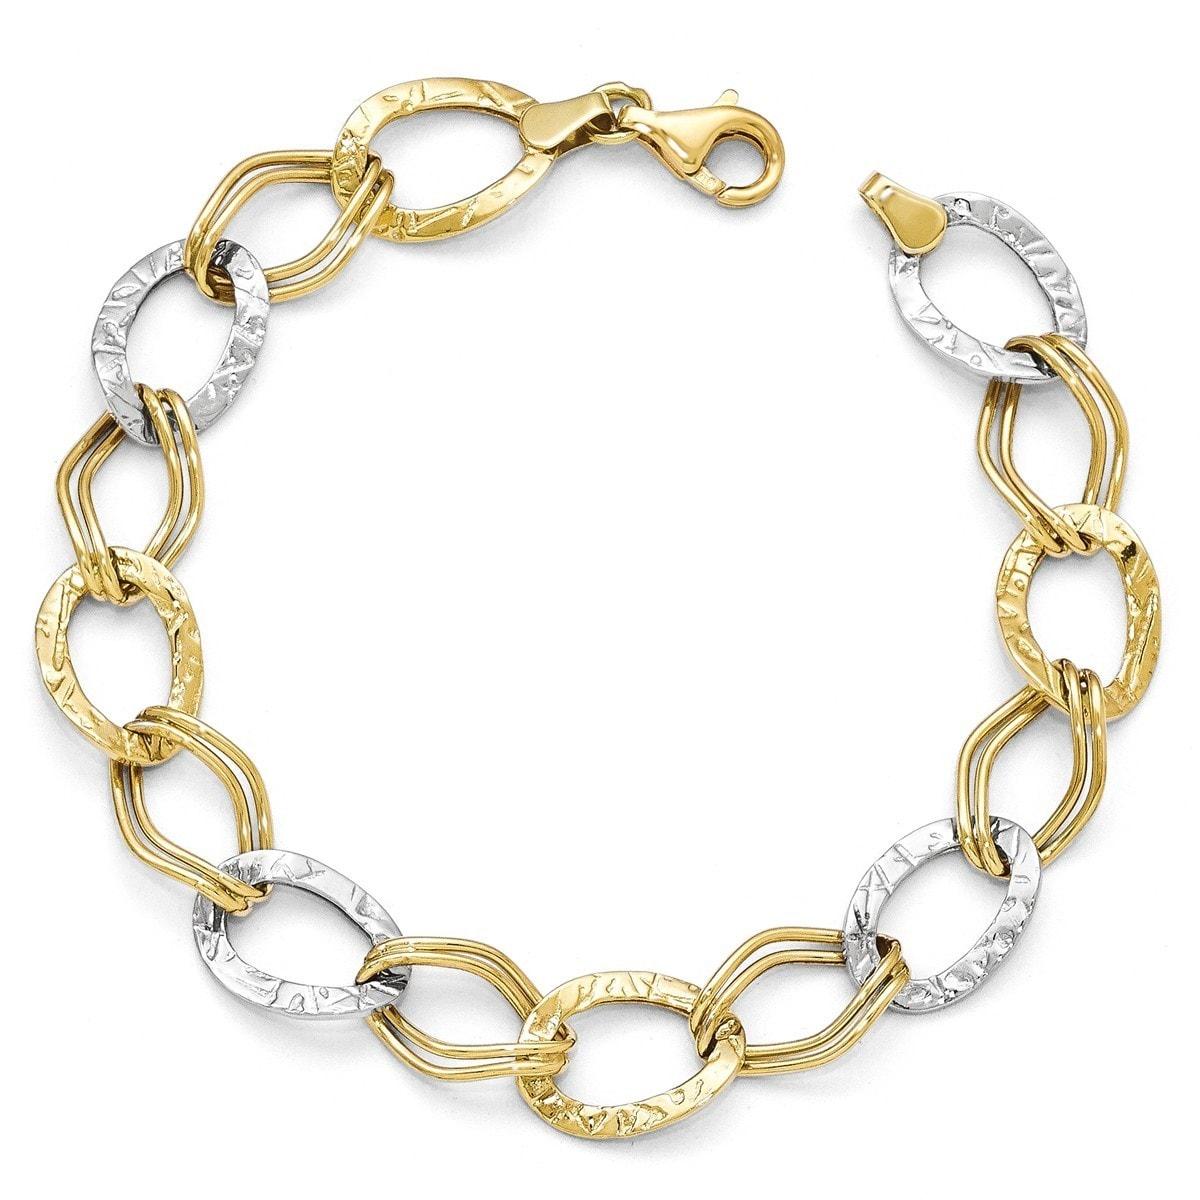 "Ladies 14k Two-Tone Gold 7mm Diamond-Cut Polished Oval Link Bracelet 7.25/"""